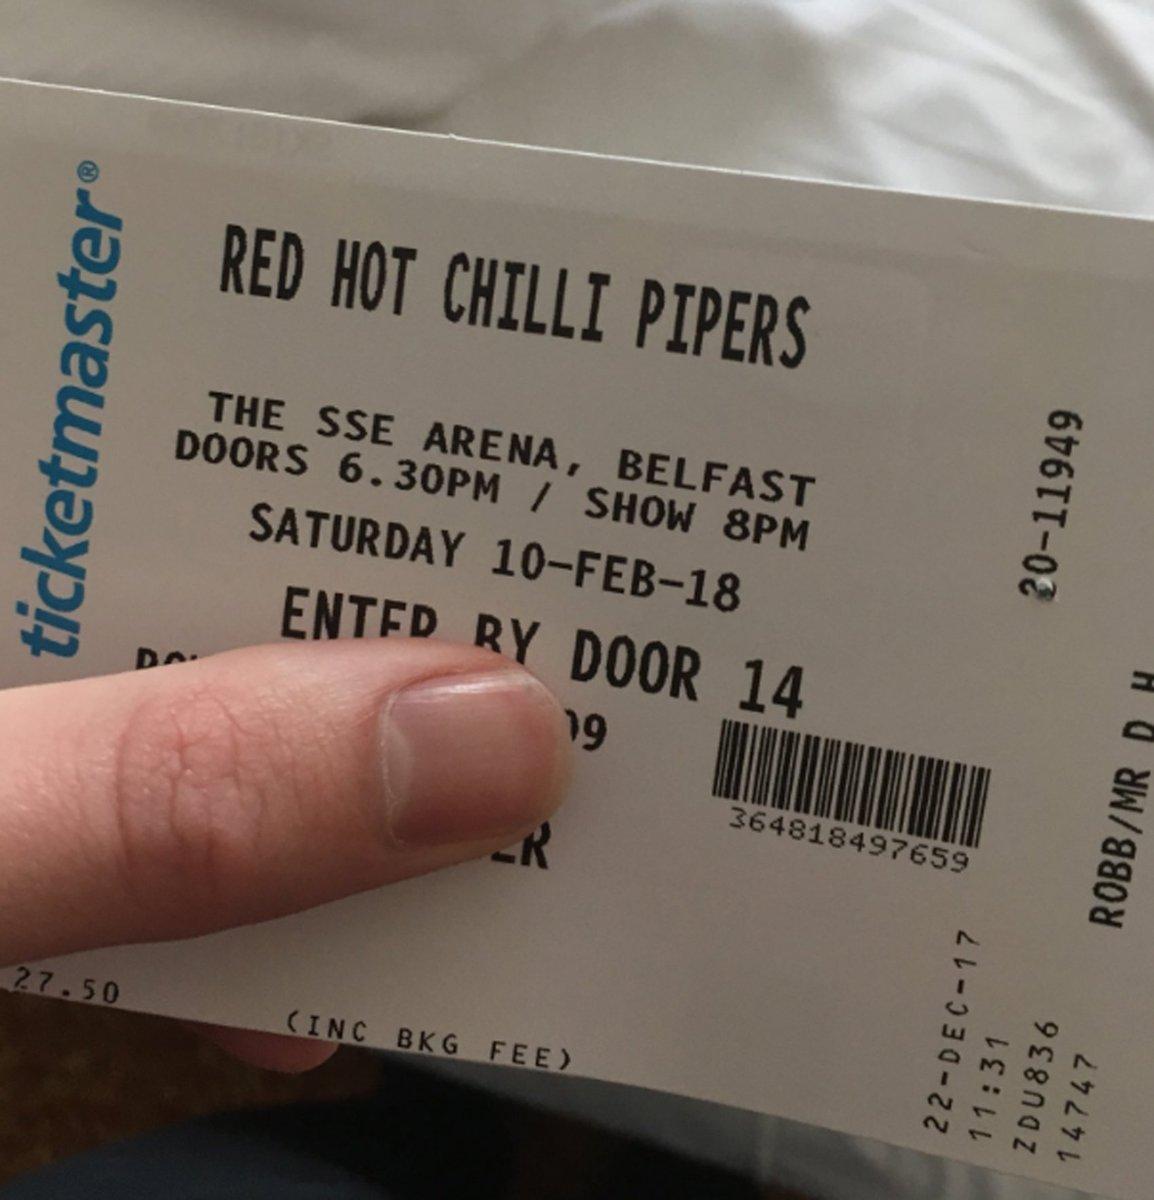 Casal vai a Belfast ver Red Hot Chili Peppers, mas descobre que comprou ingresso para show de gaita de foles https://t.co/rn6a6dgb2Y #Planeta Bizarro #G1